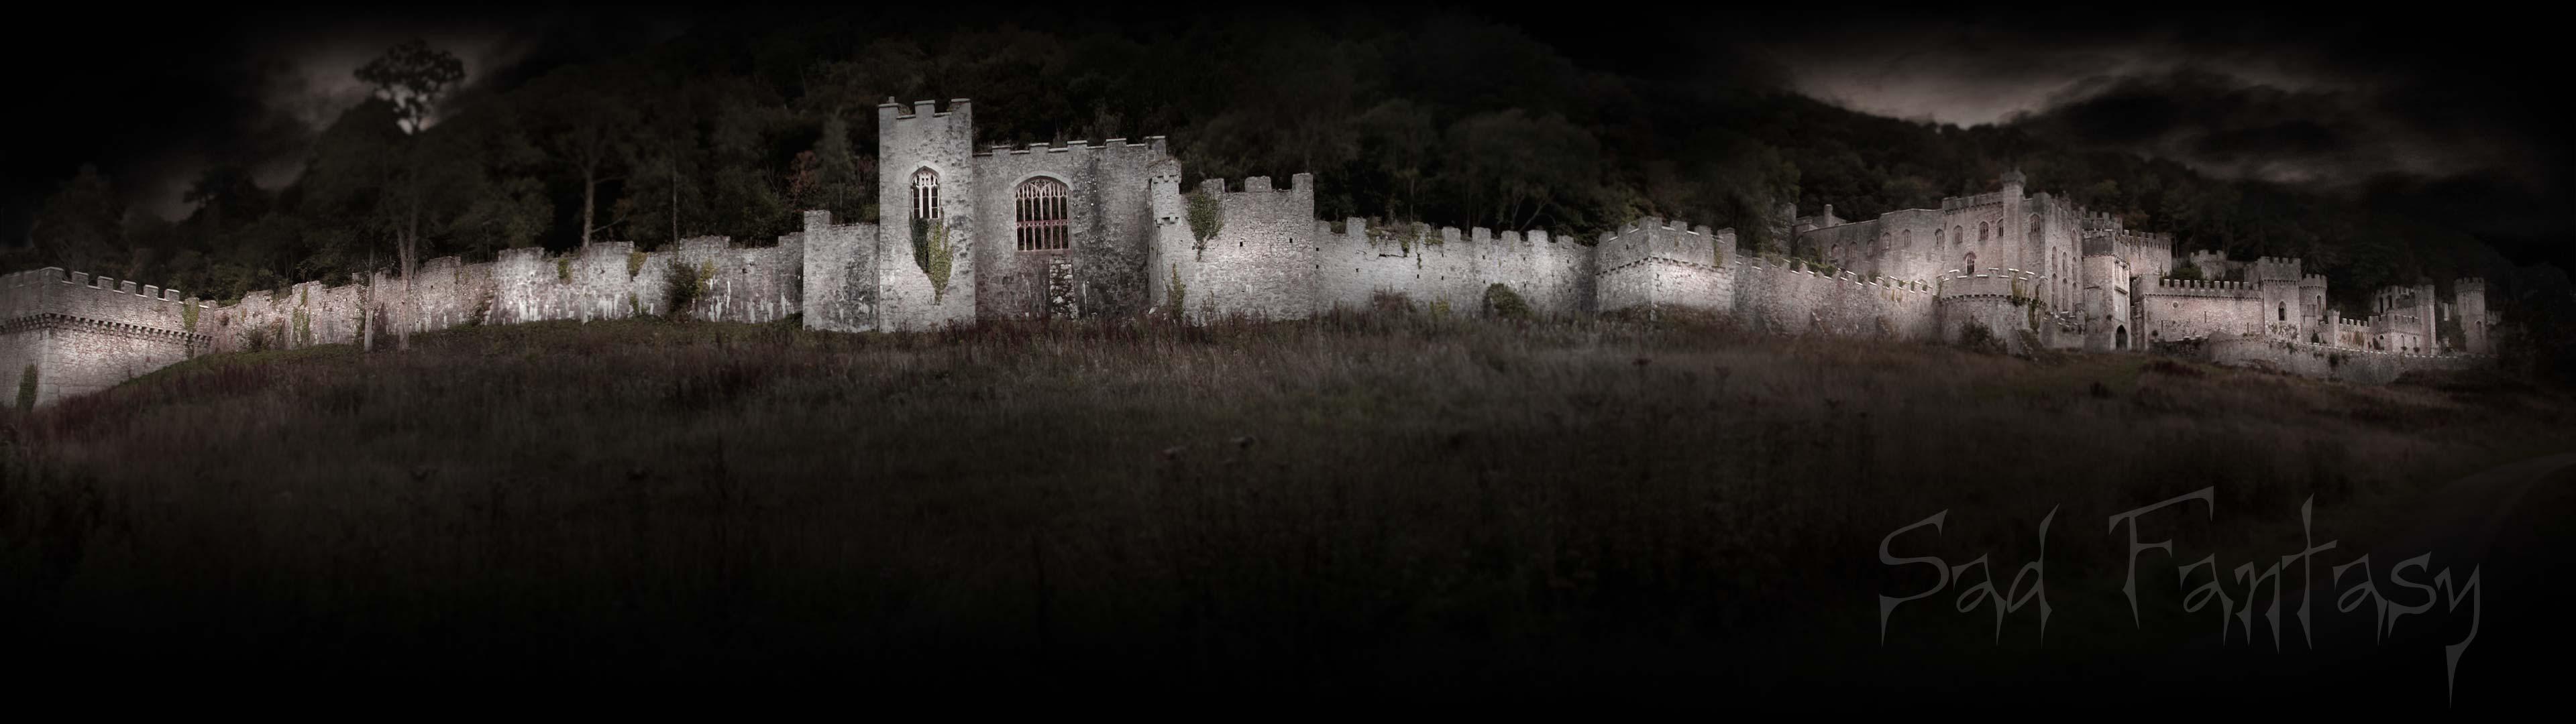 Sad Fantasy wallpaper. Fantasy, gothic image of Gwrych Castle